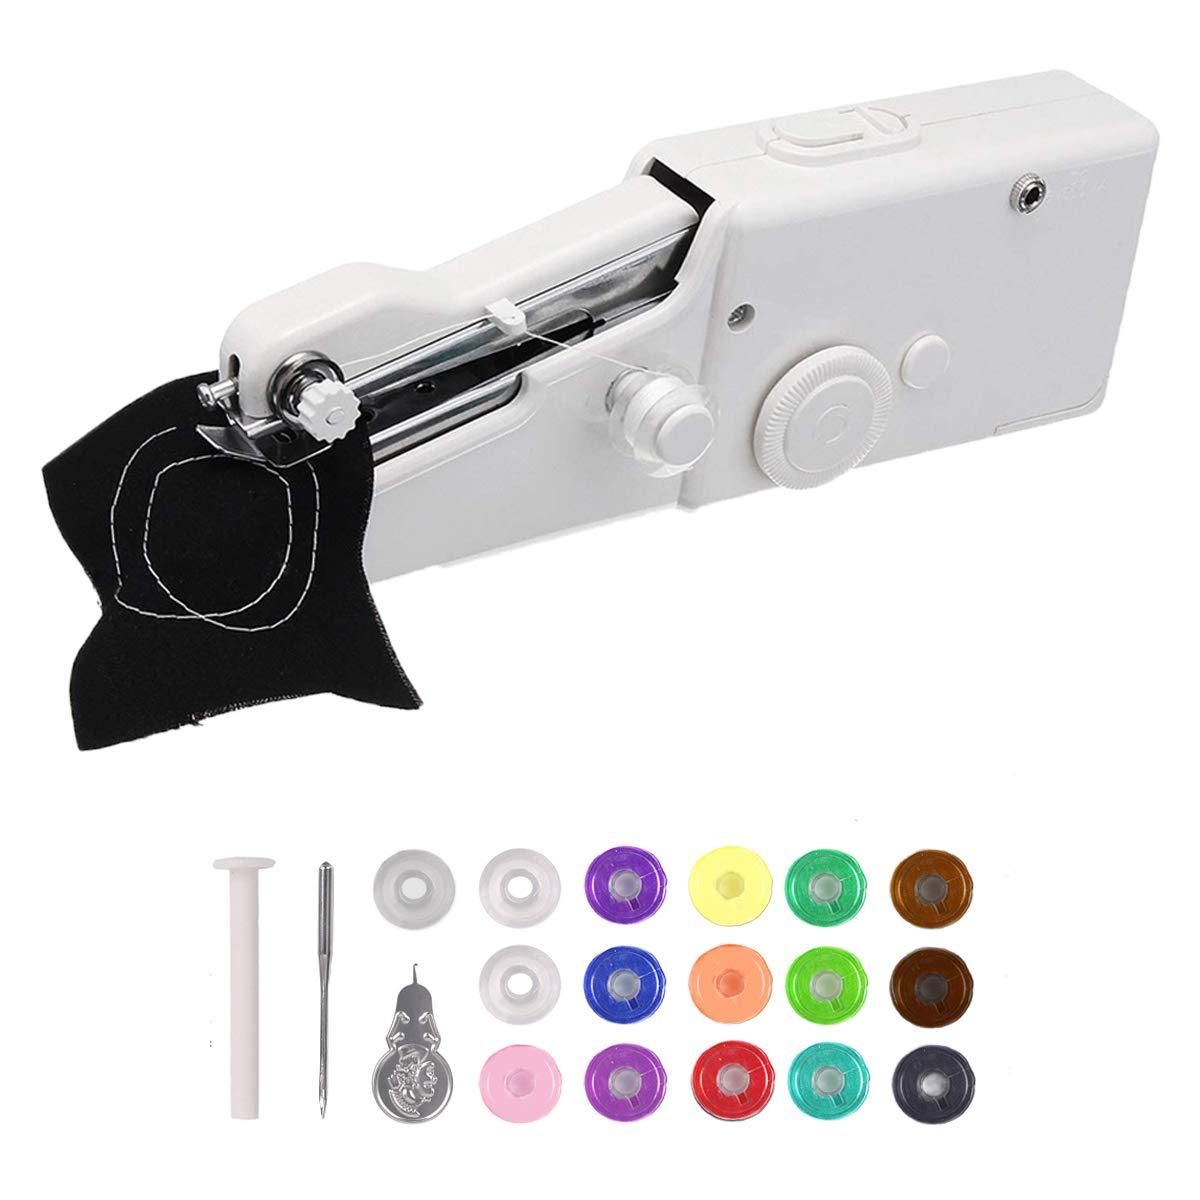 Handheld Sewing Machine,Portable Sewing Machine, MSDADA Mini Sewing Machine for Quick Repairs,Home Stitching,DIY, Birthday,Children's Day Gift for Kids with 16Pcs Bobbins